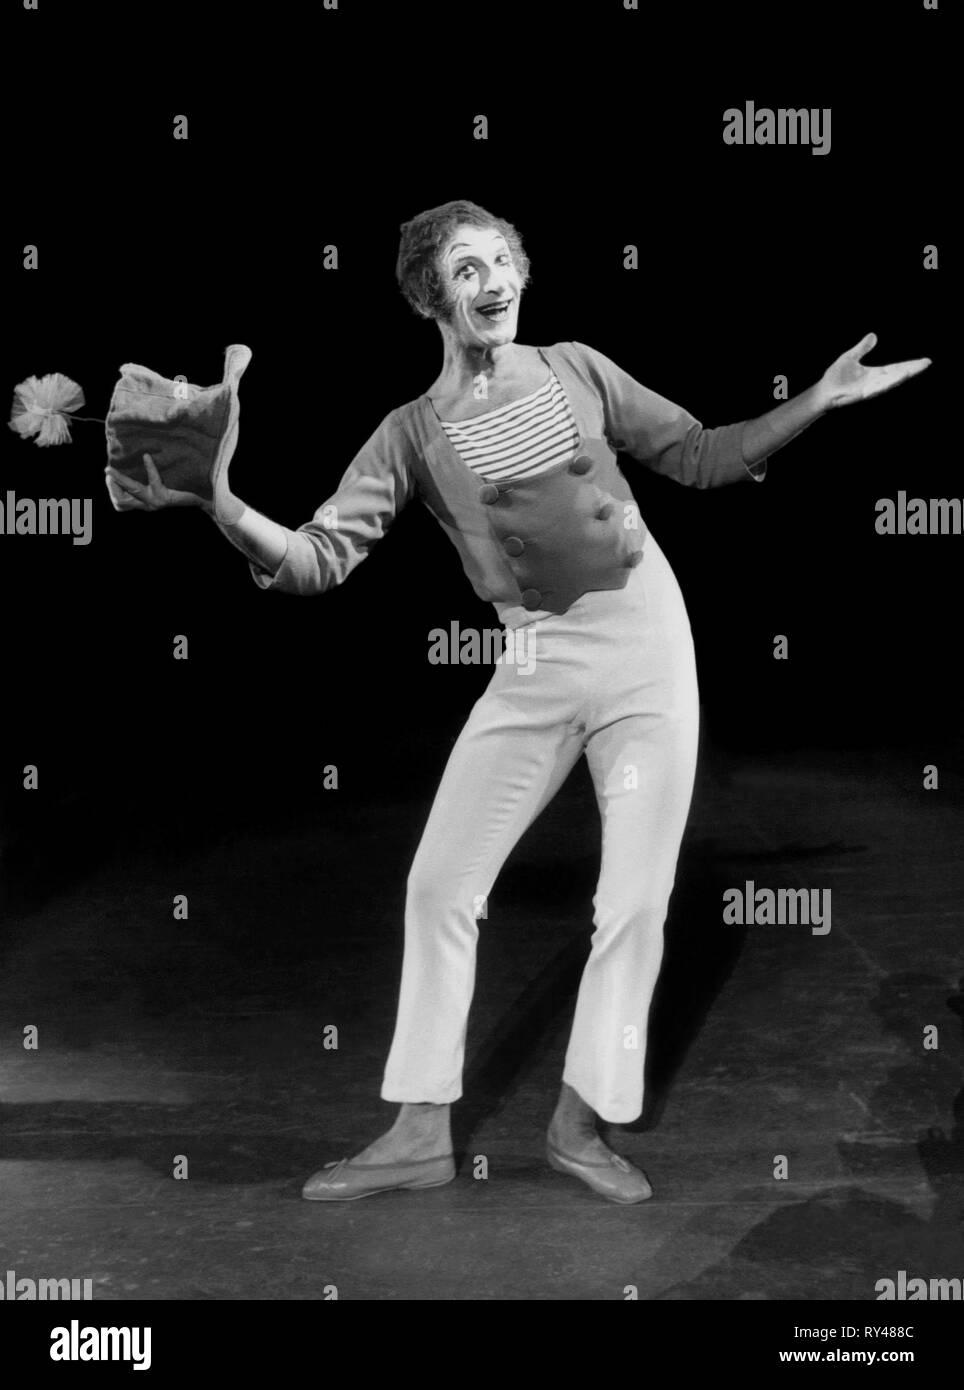 MARCEL MARCEAU, PANTOMIMES, 1954 - Stock Image